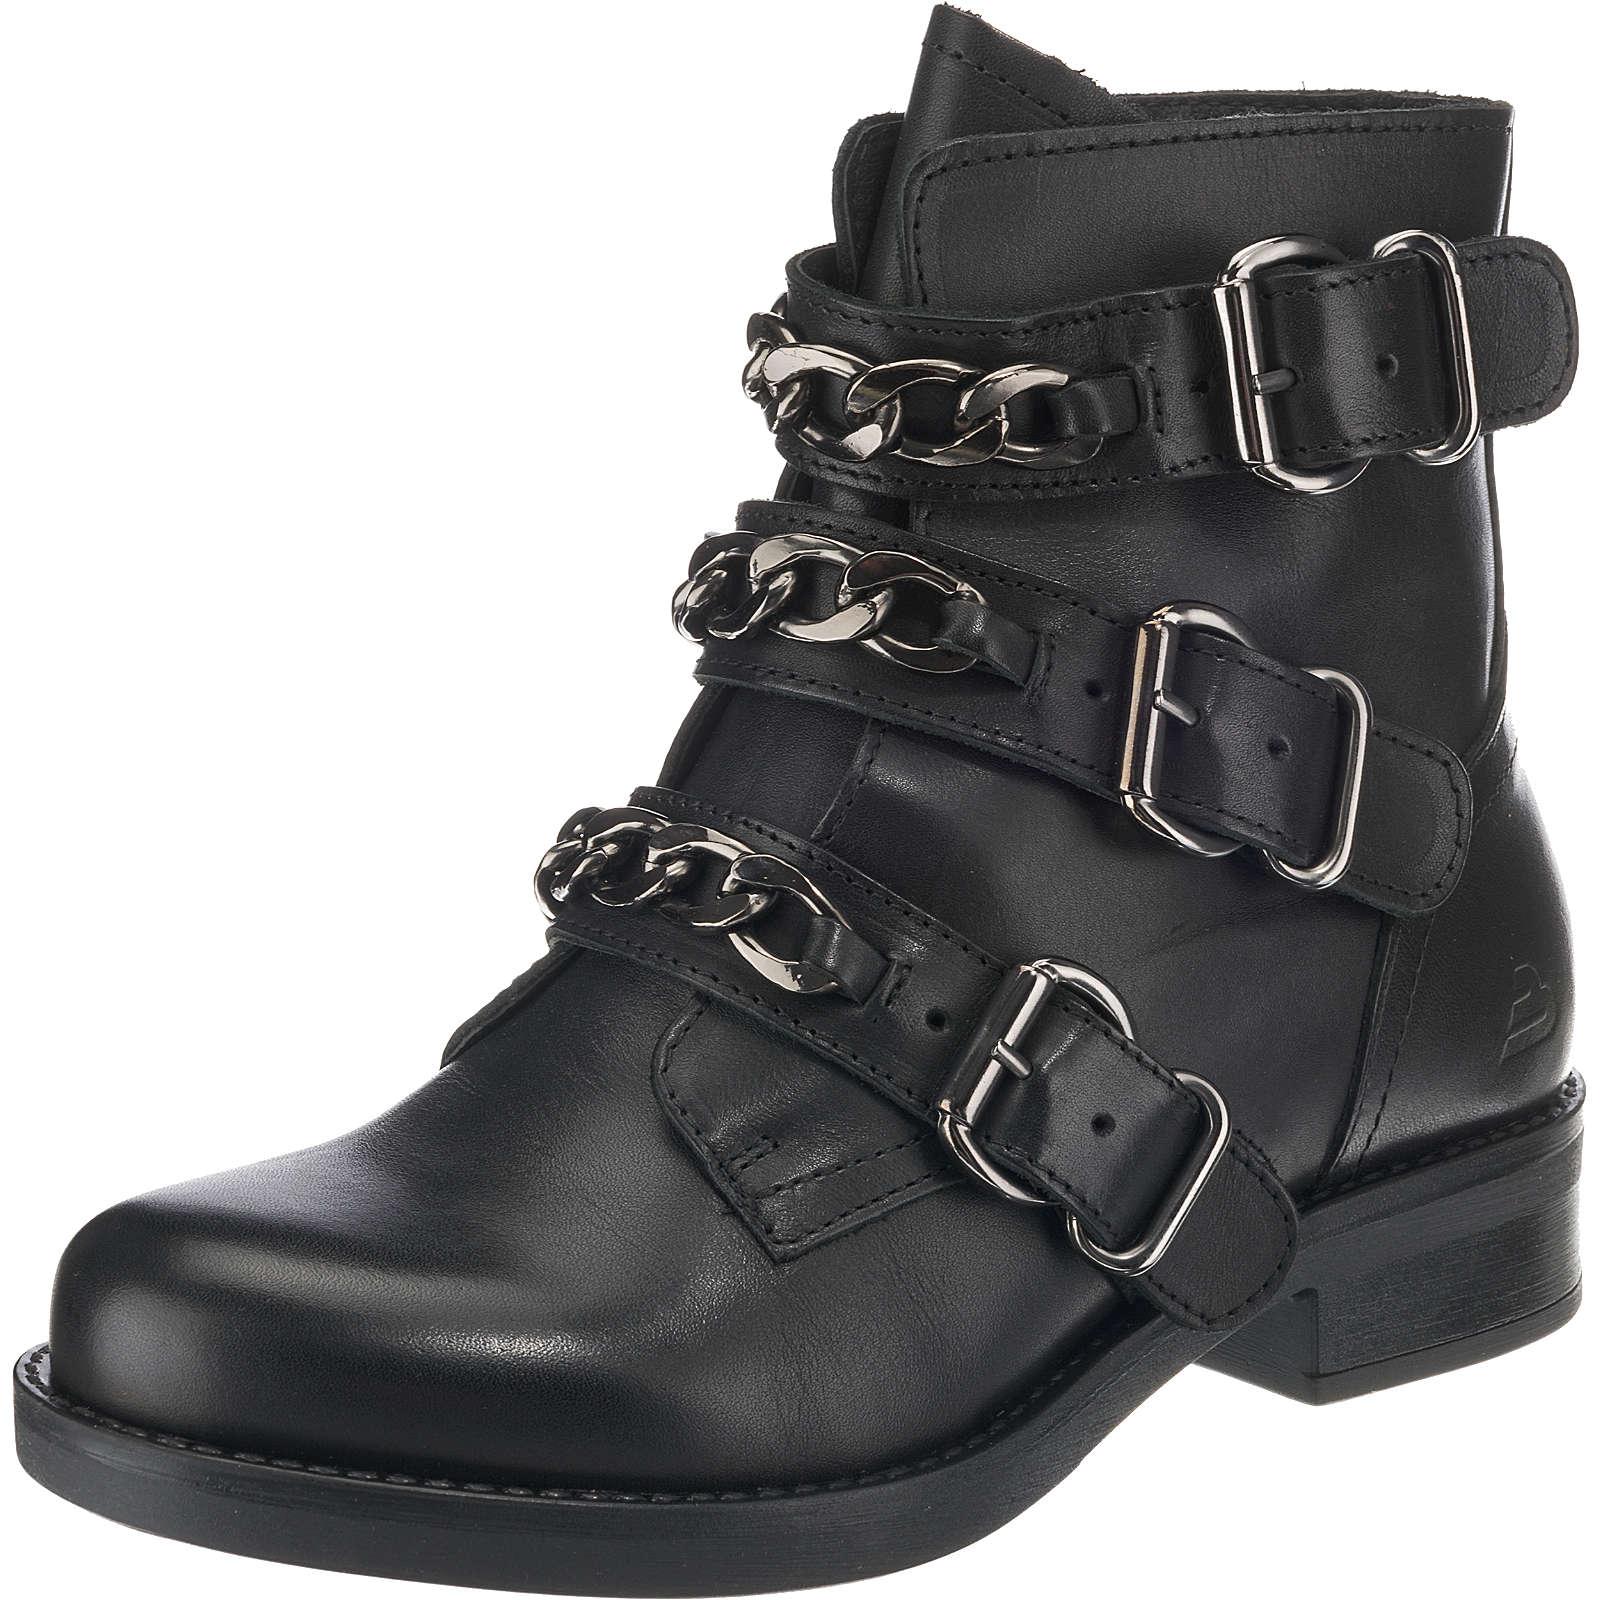 BULLBOXER Biker Boots schwarz Damen Gr. 39